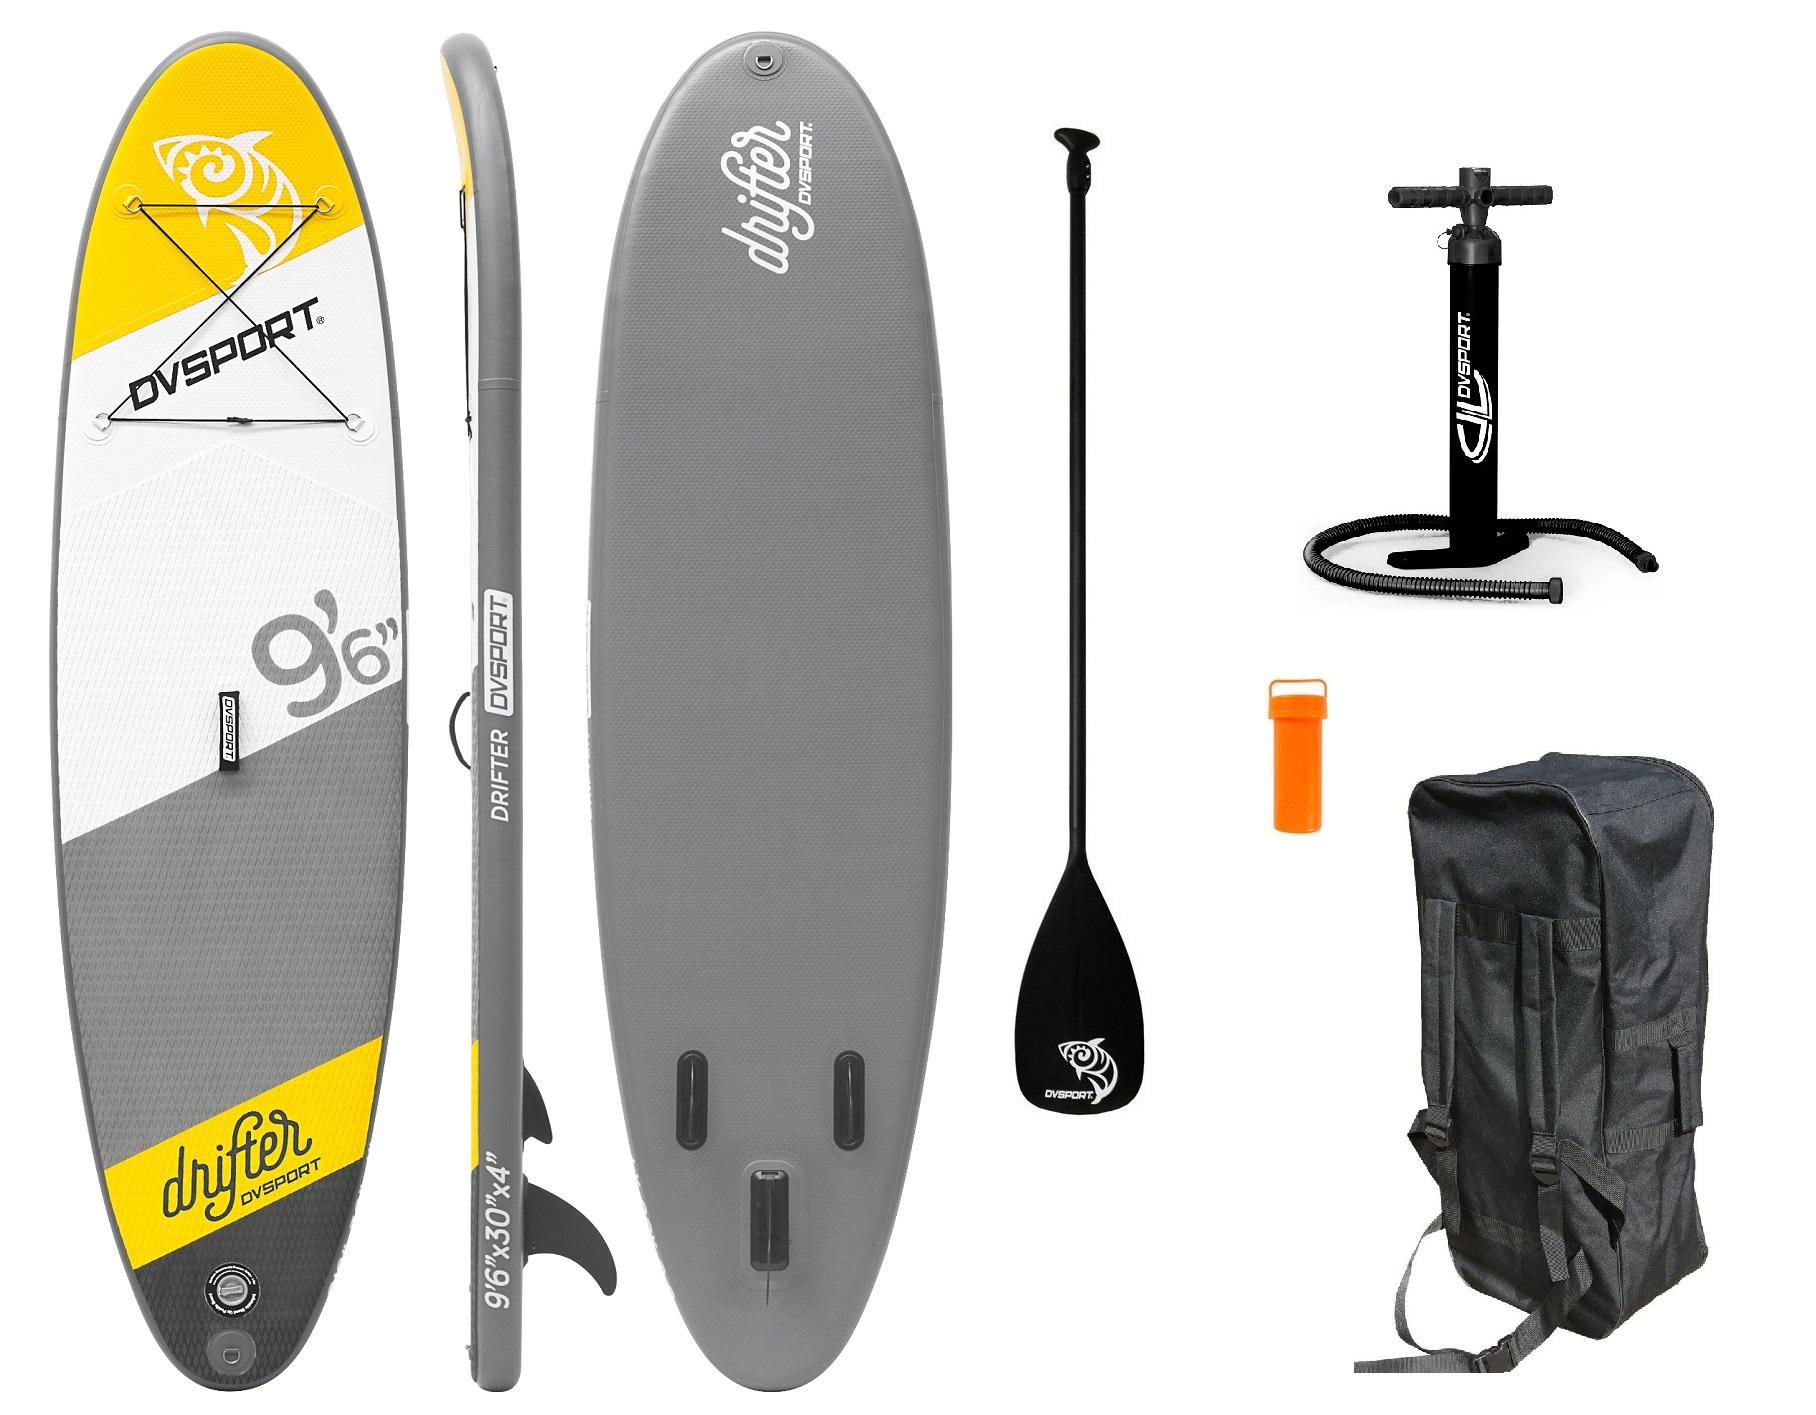 SUP DVSport 22205 Stand-Up-Paddle-Set Drifter aufblasbar 290x75x10cm Bild 1